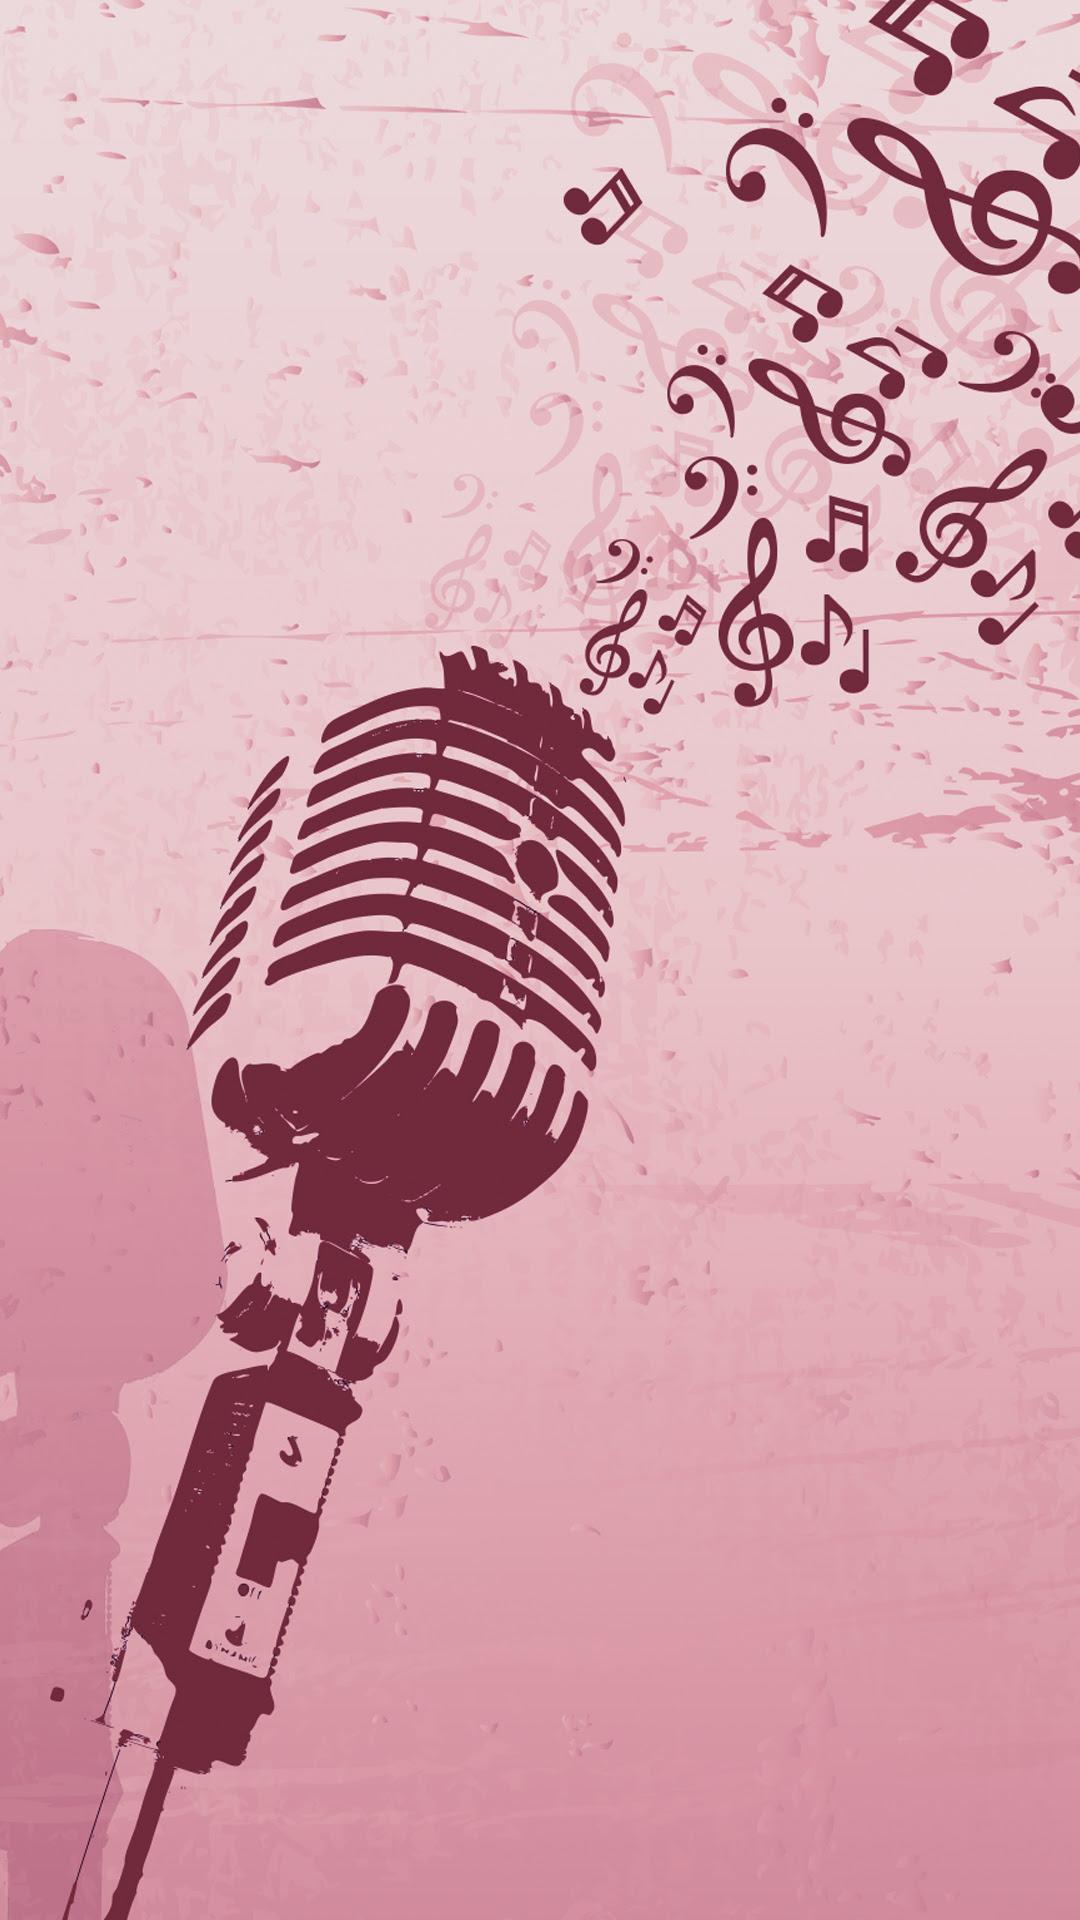 Free Hd Retro Microphone Phone Wallpaper4457